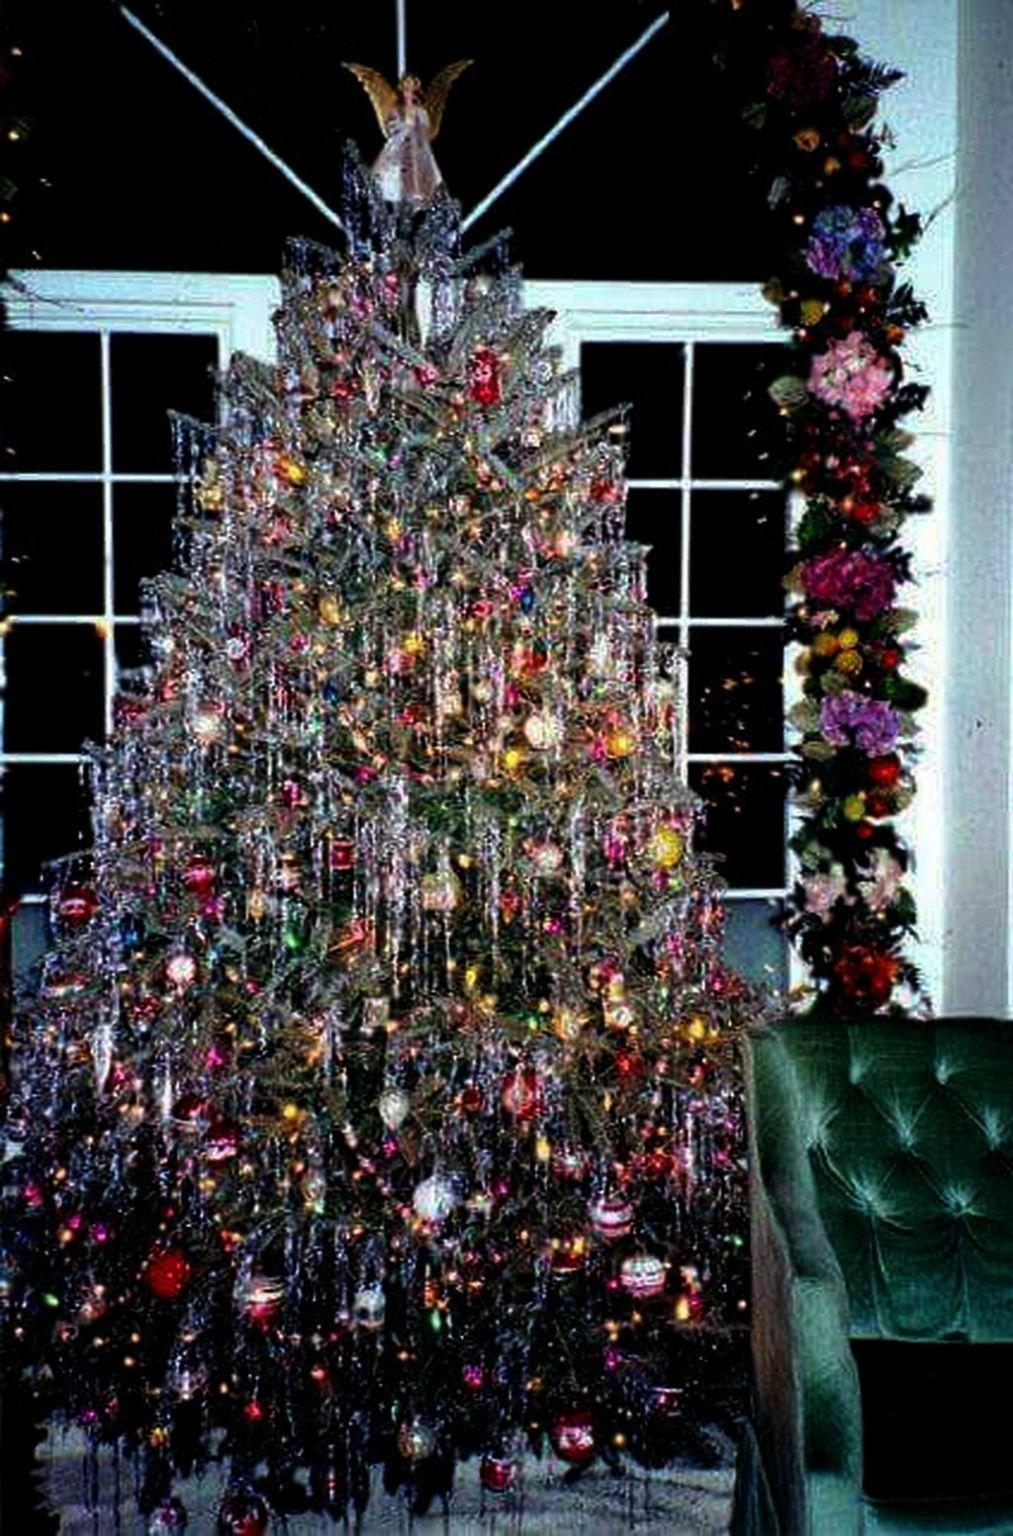 Weihnachtsbilder Pinterest.Christmas Chronicles Imdb Minus Simple Christmas Trees Pinterest